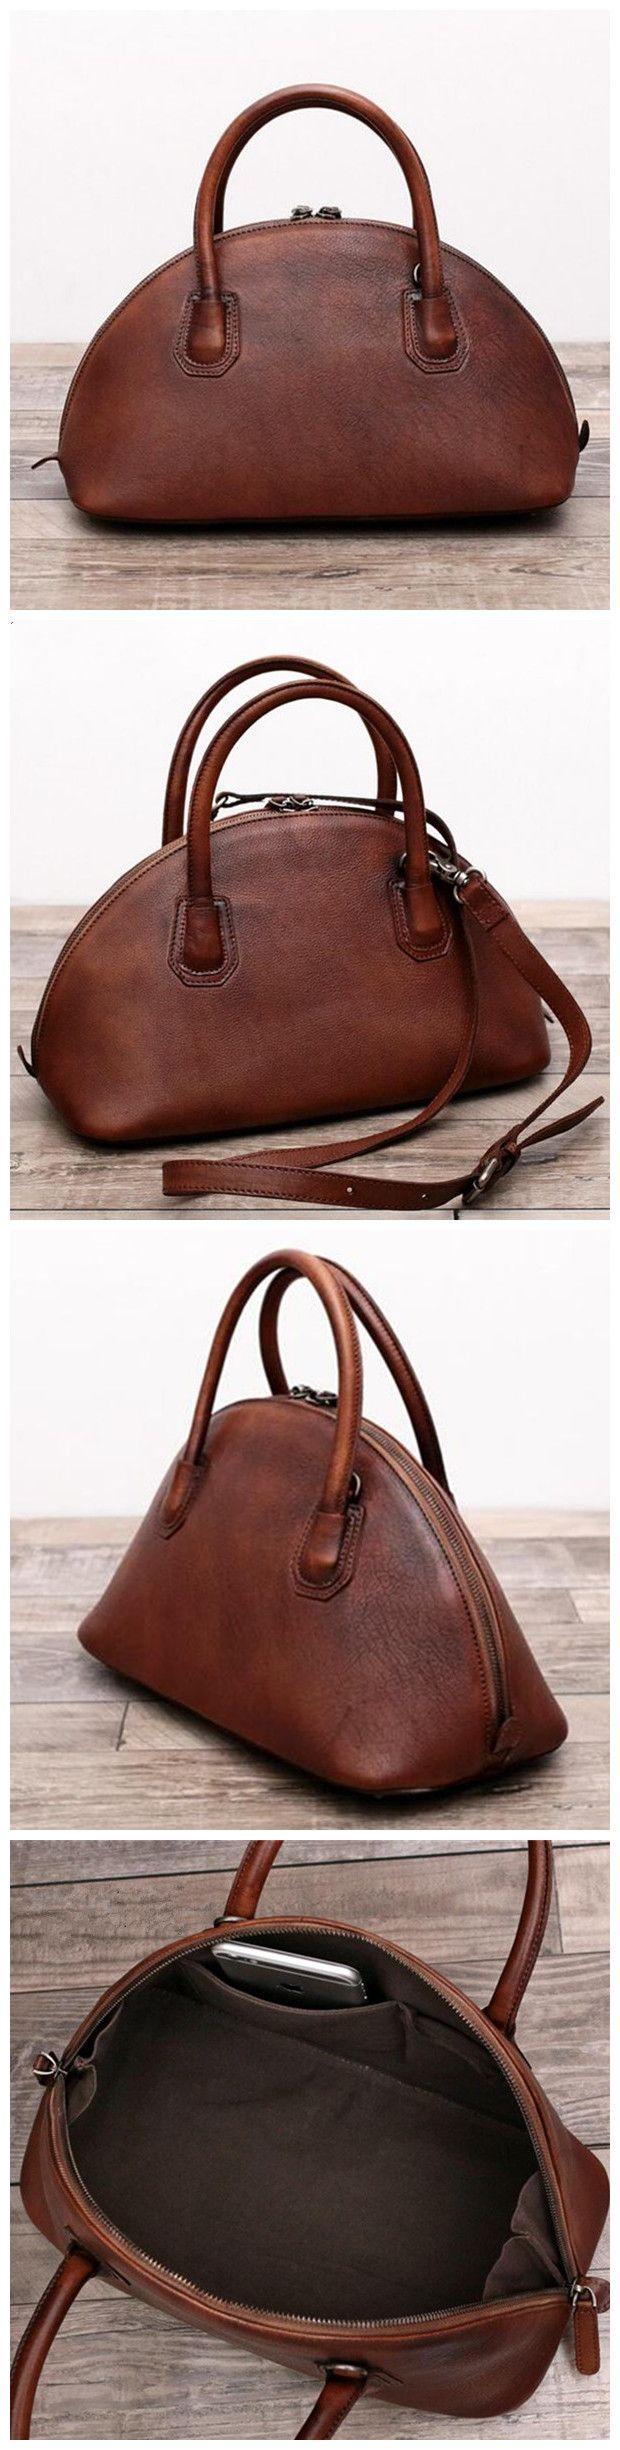 Leather Women Handbag Shoulder Bag Cross body Satchel